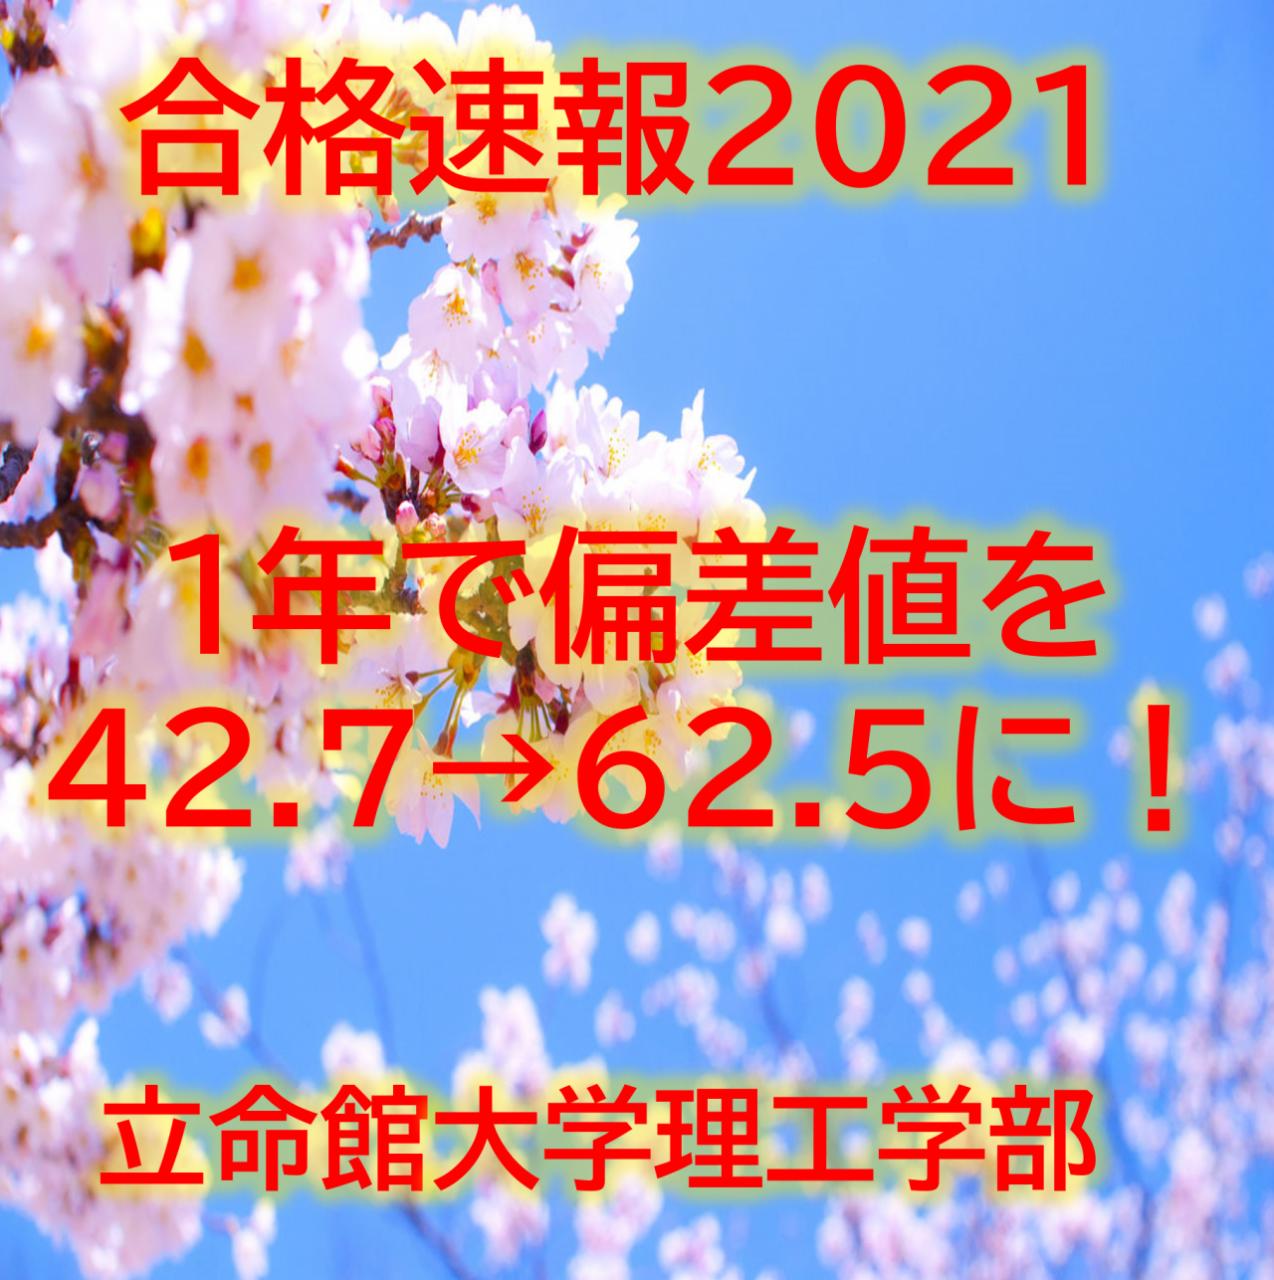 2021-04-07 (5)